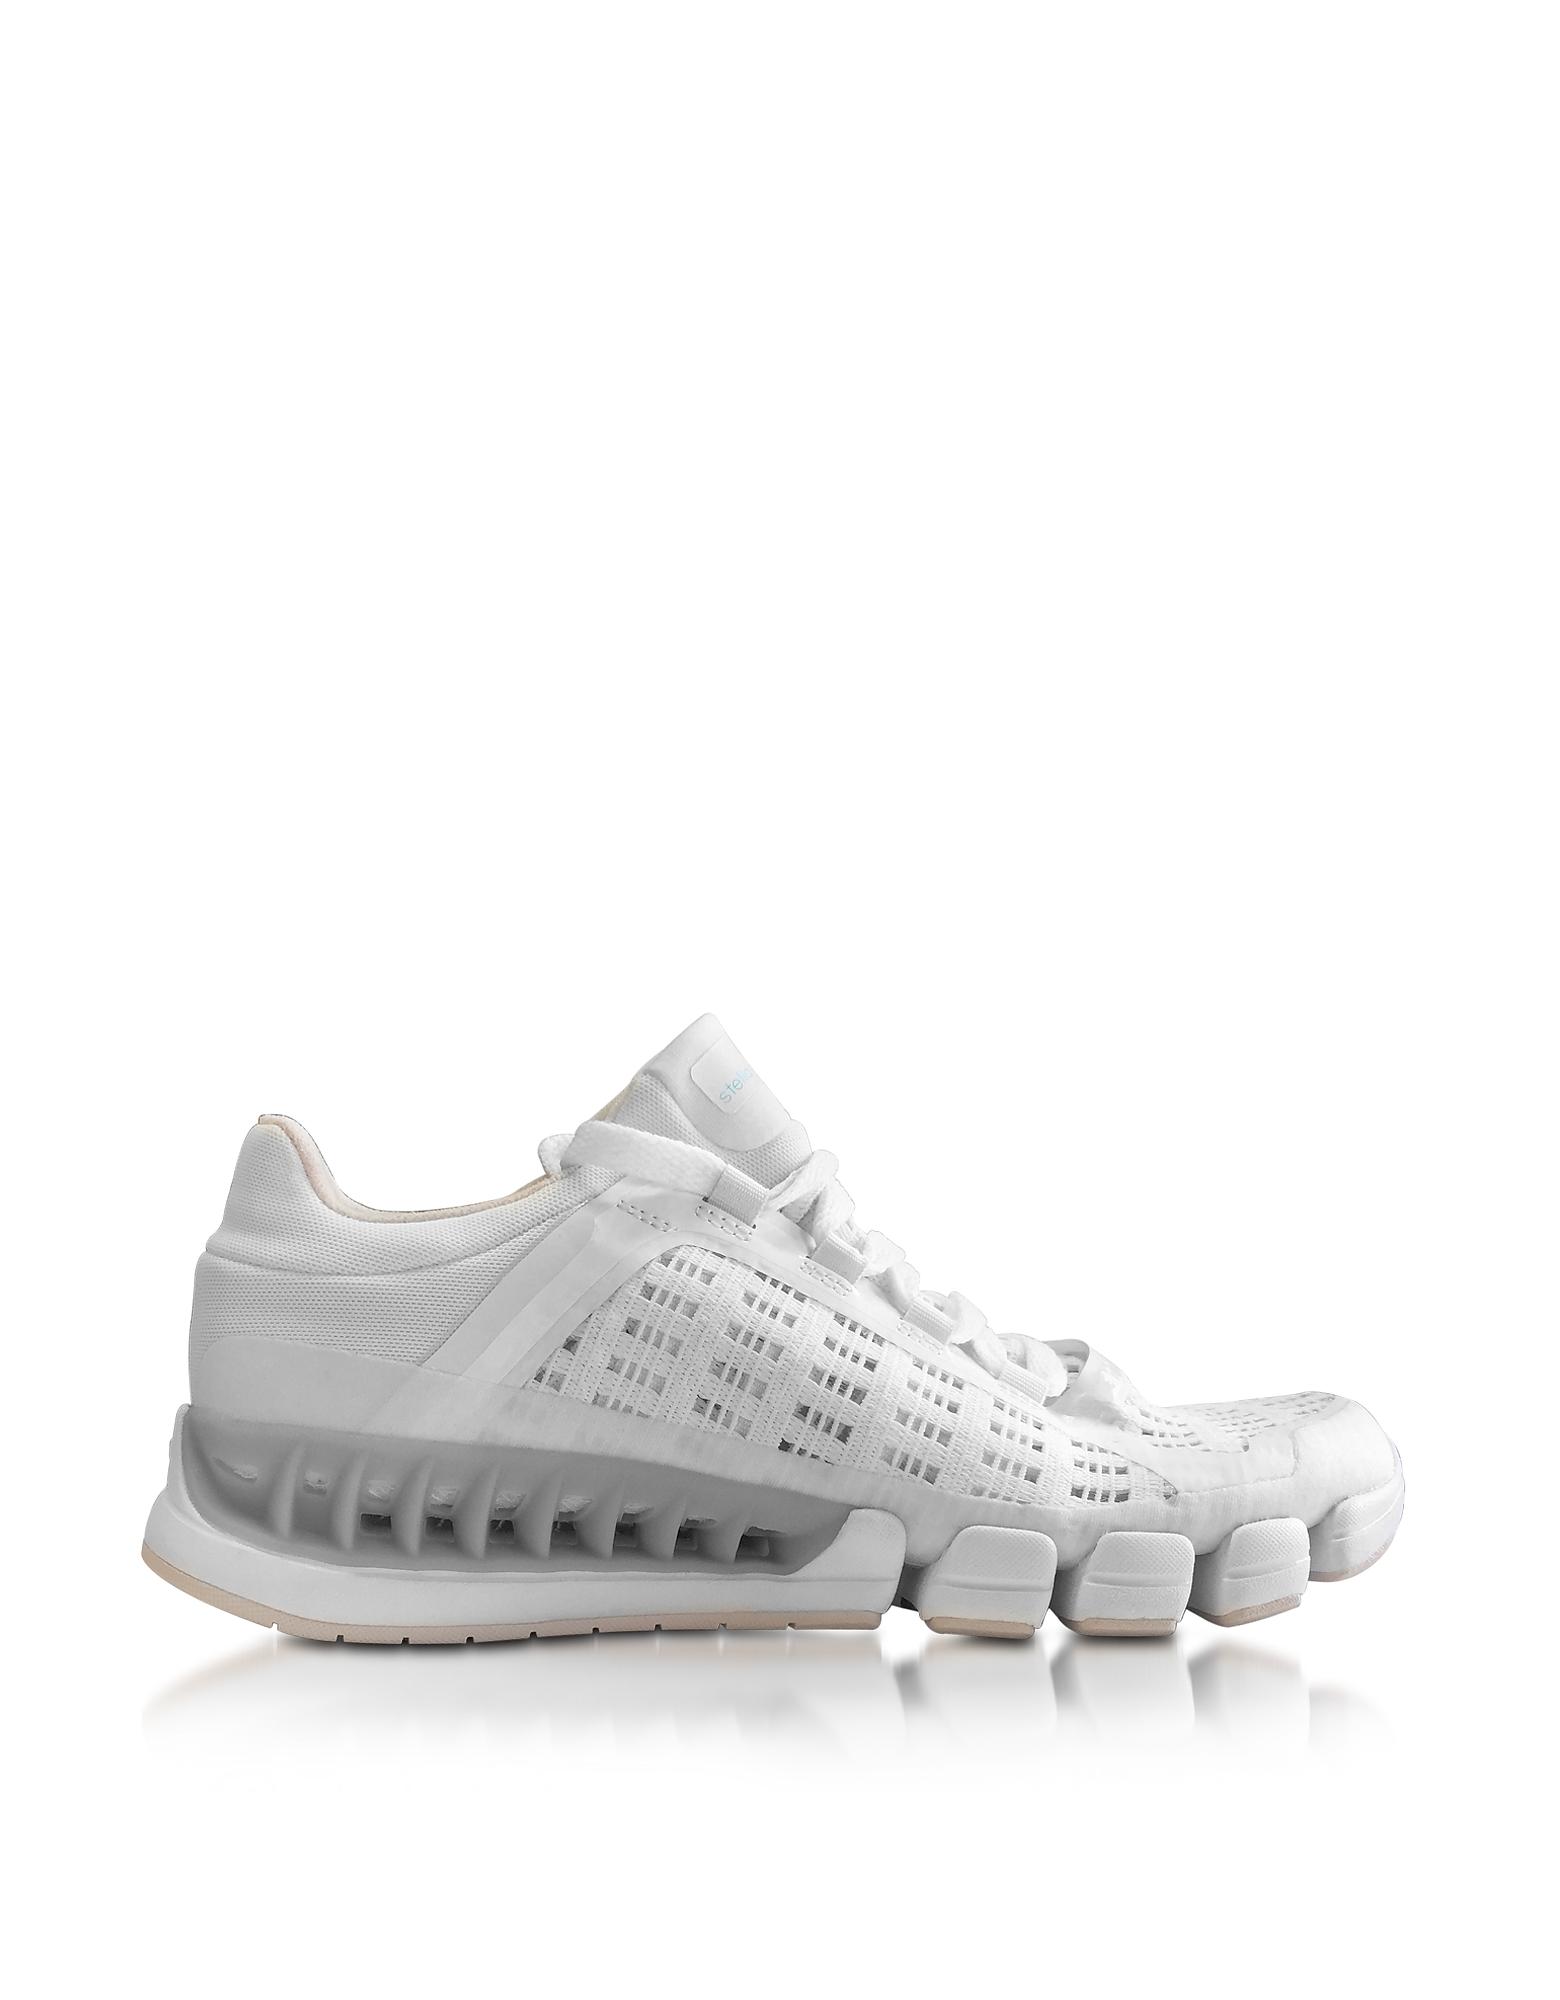 Adidas Stella McCartney Clima Cool Revolution - Белые Женские Кеды